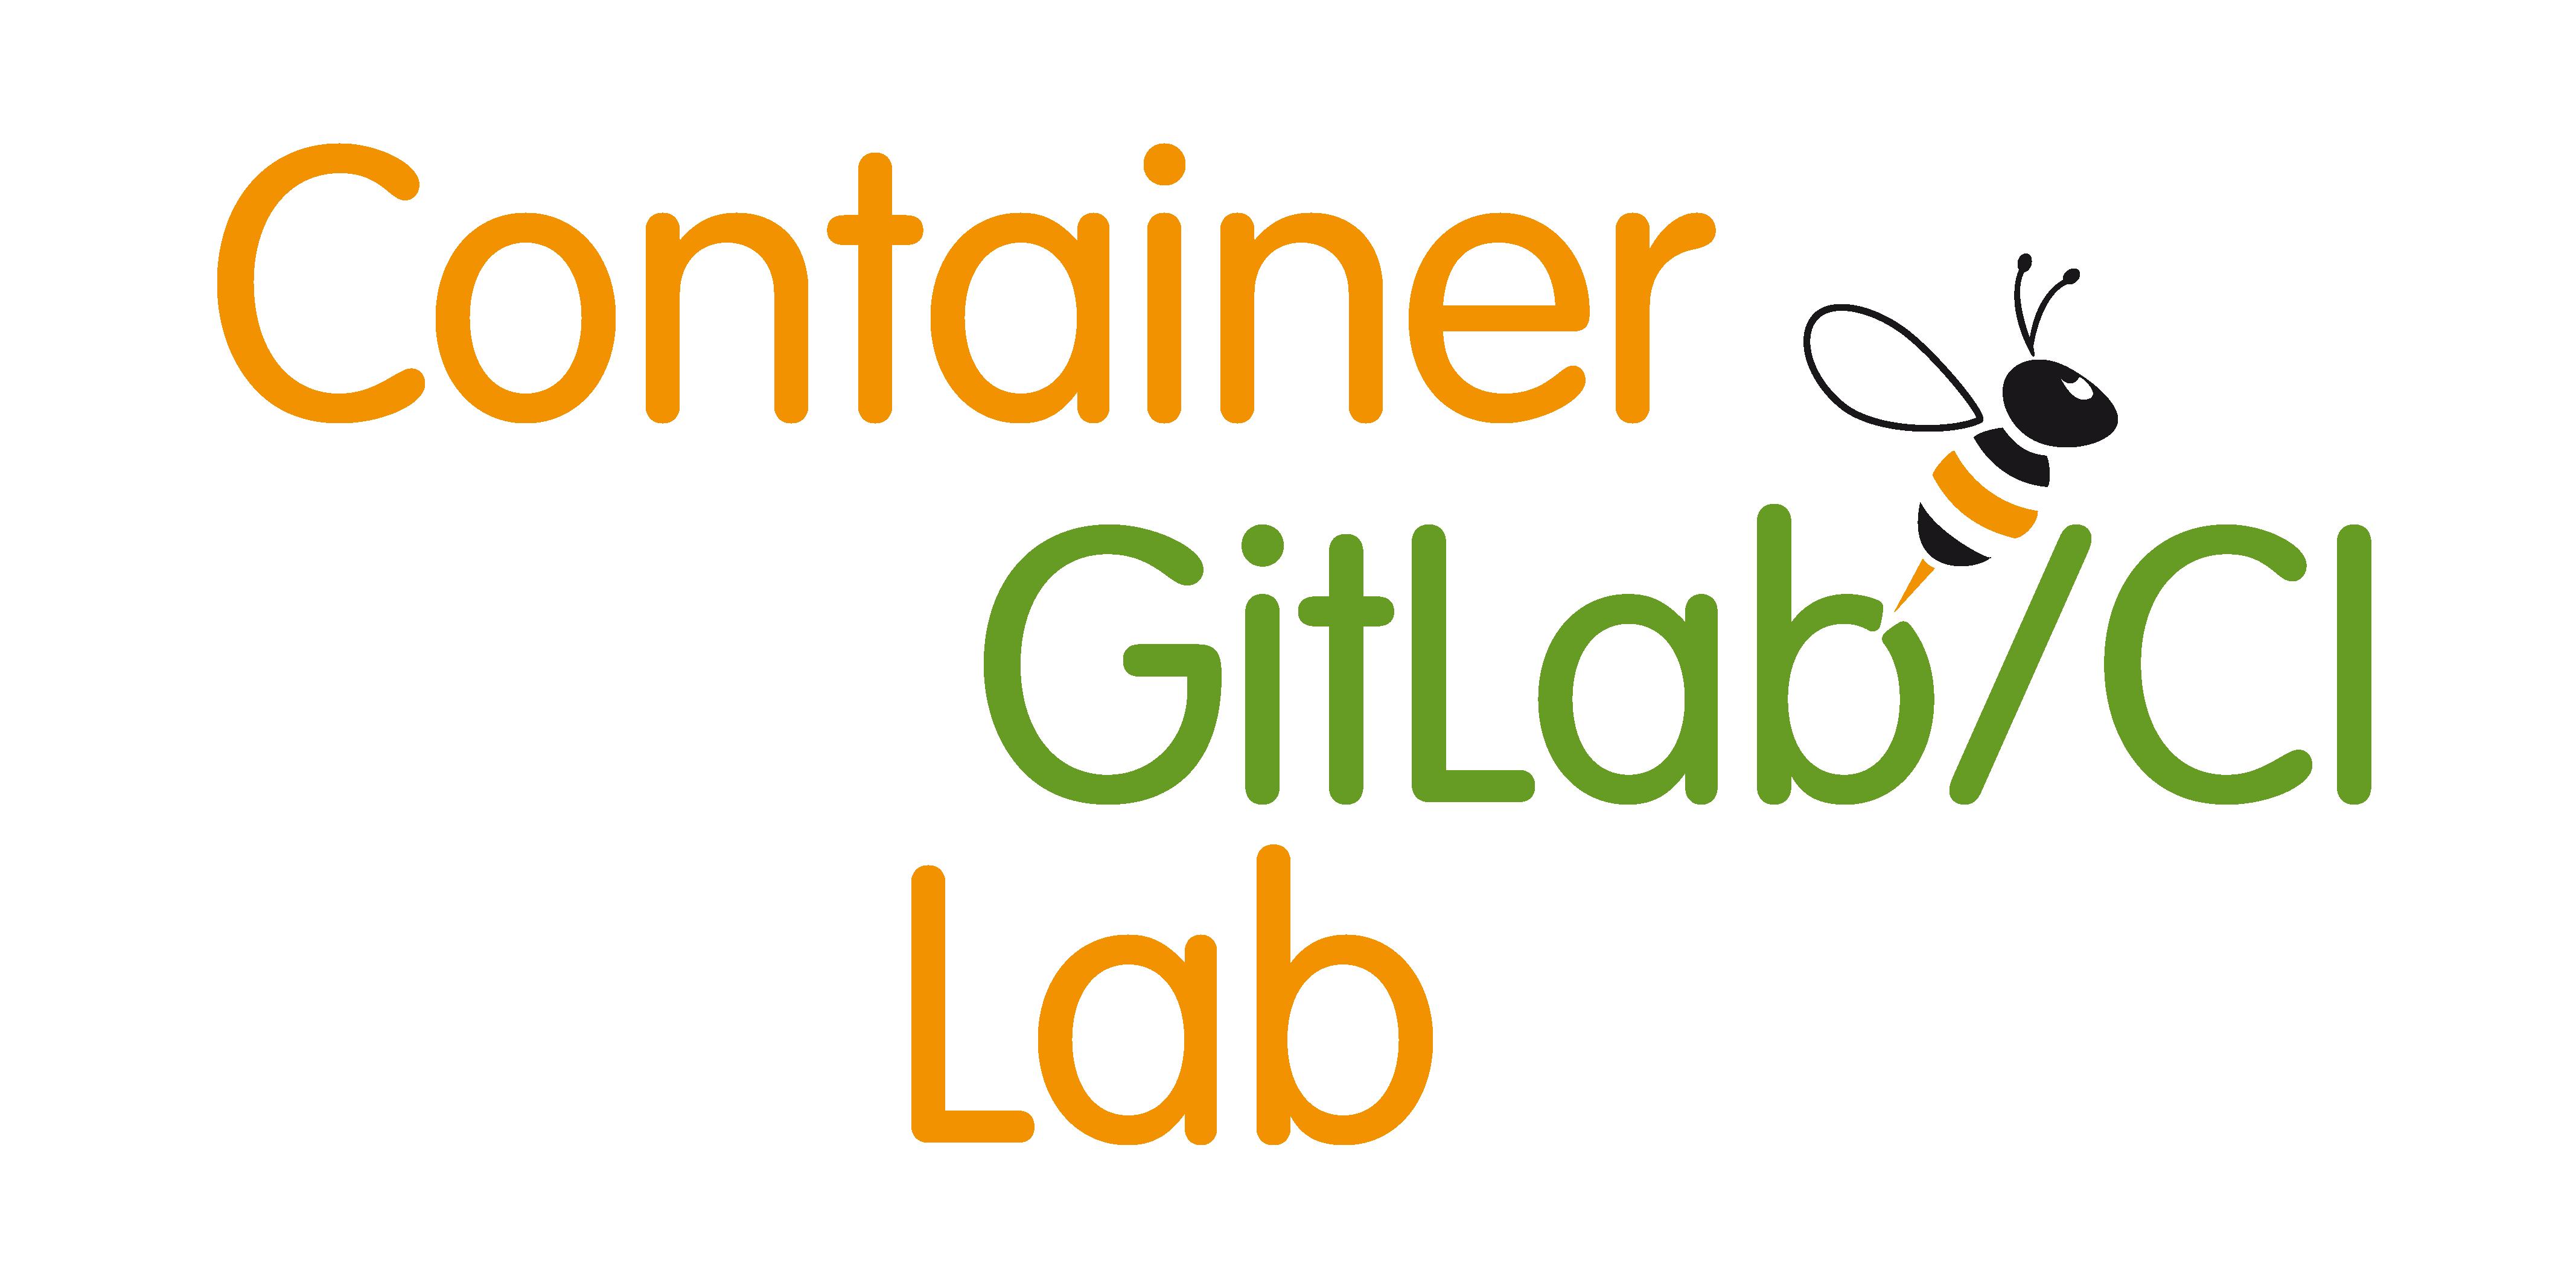 Container GitLab/CI Lab